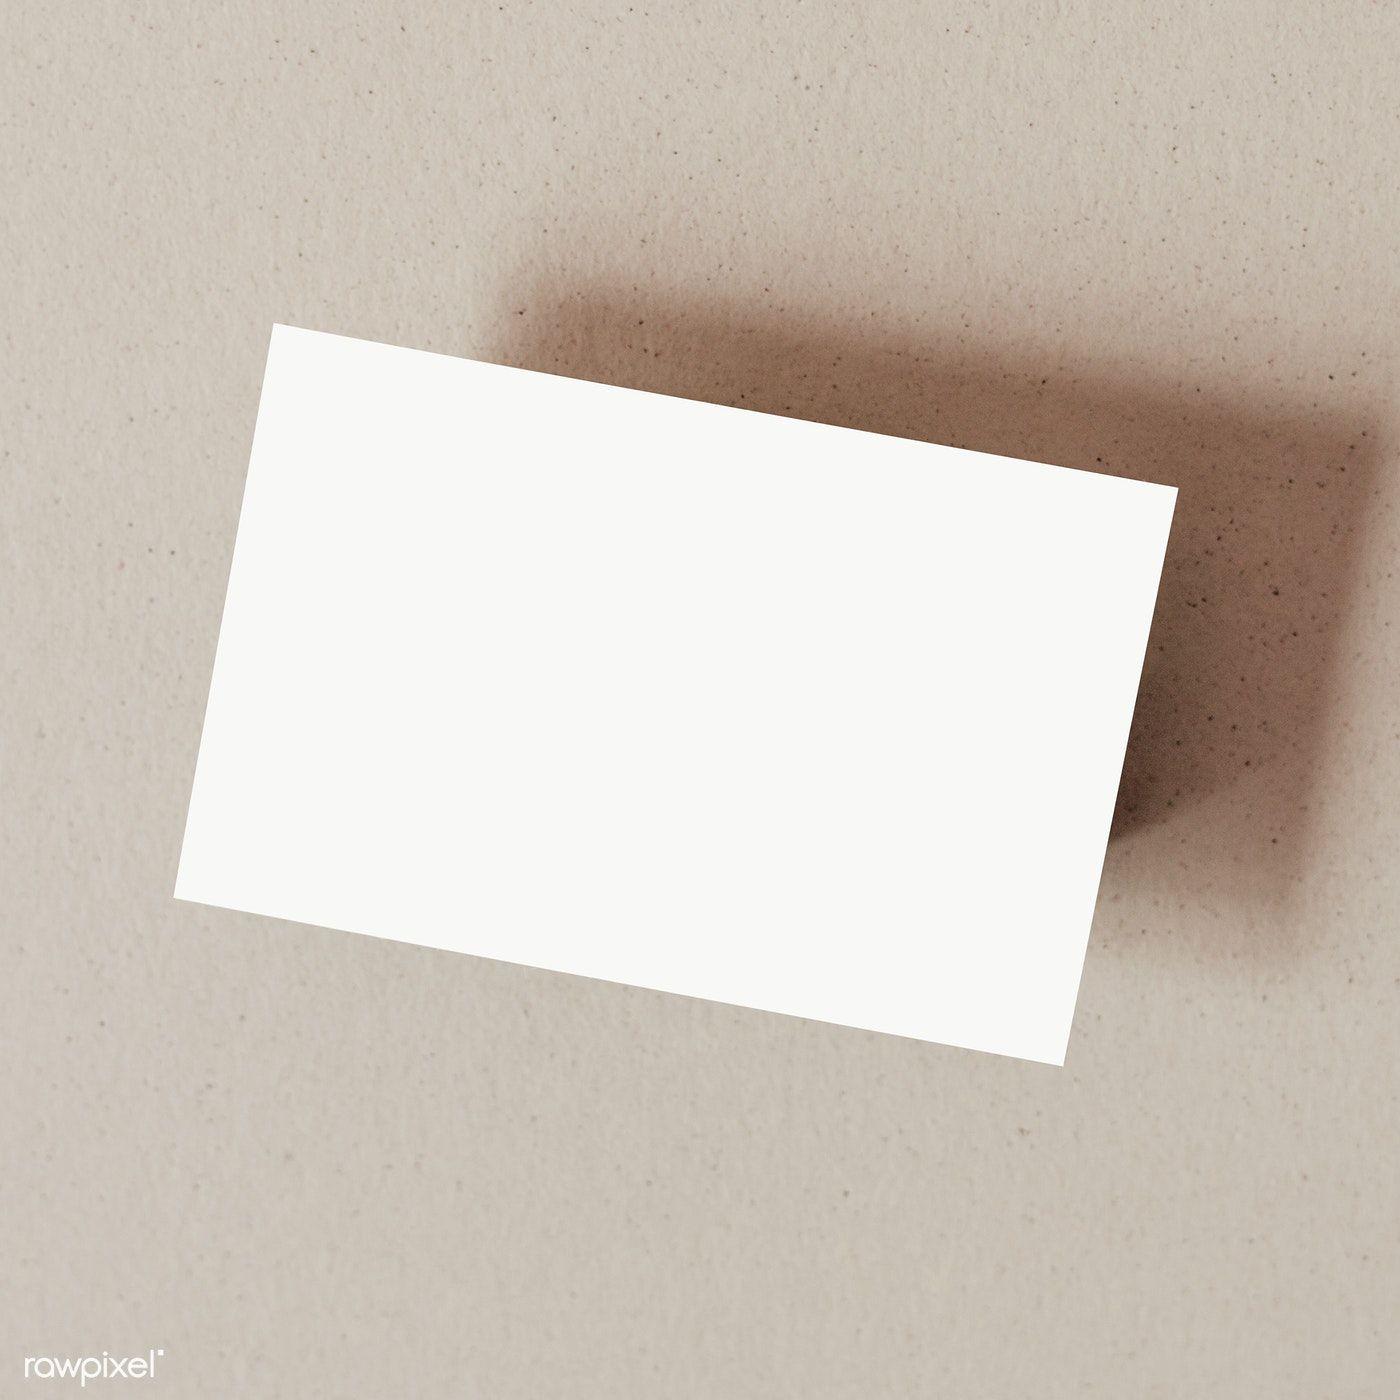 Blank Card Transparent Png Premium Image By Rawpixel Com Karolina Kaboompics Blank Cards Business Card Design Minimal Blank Cards And Envelopes